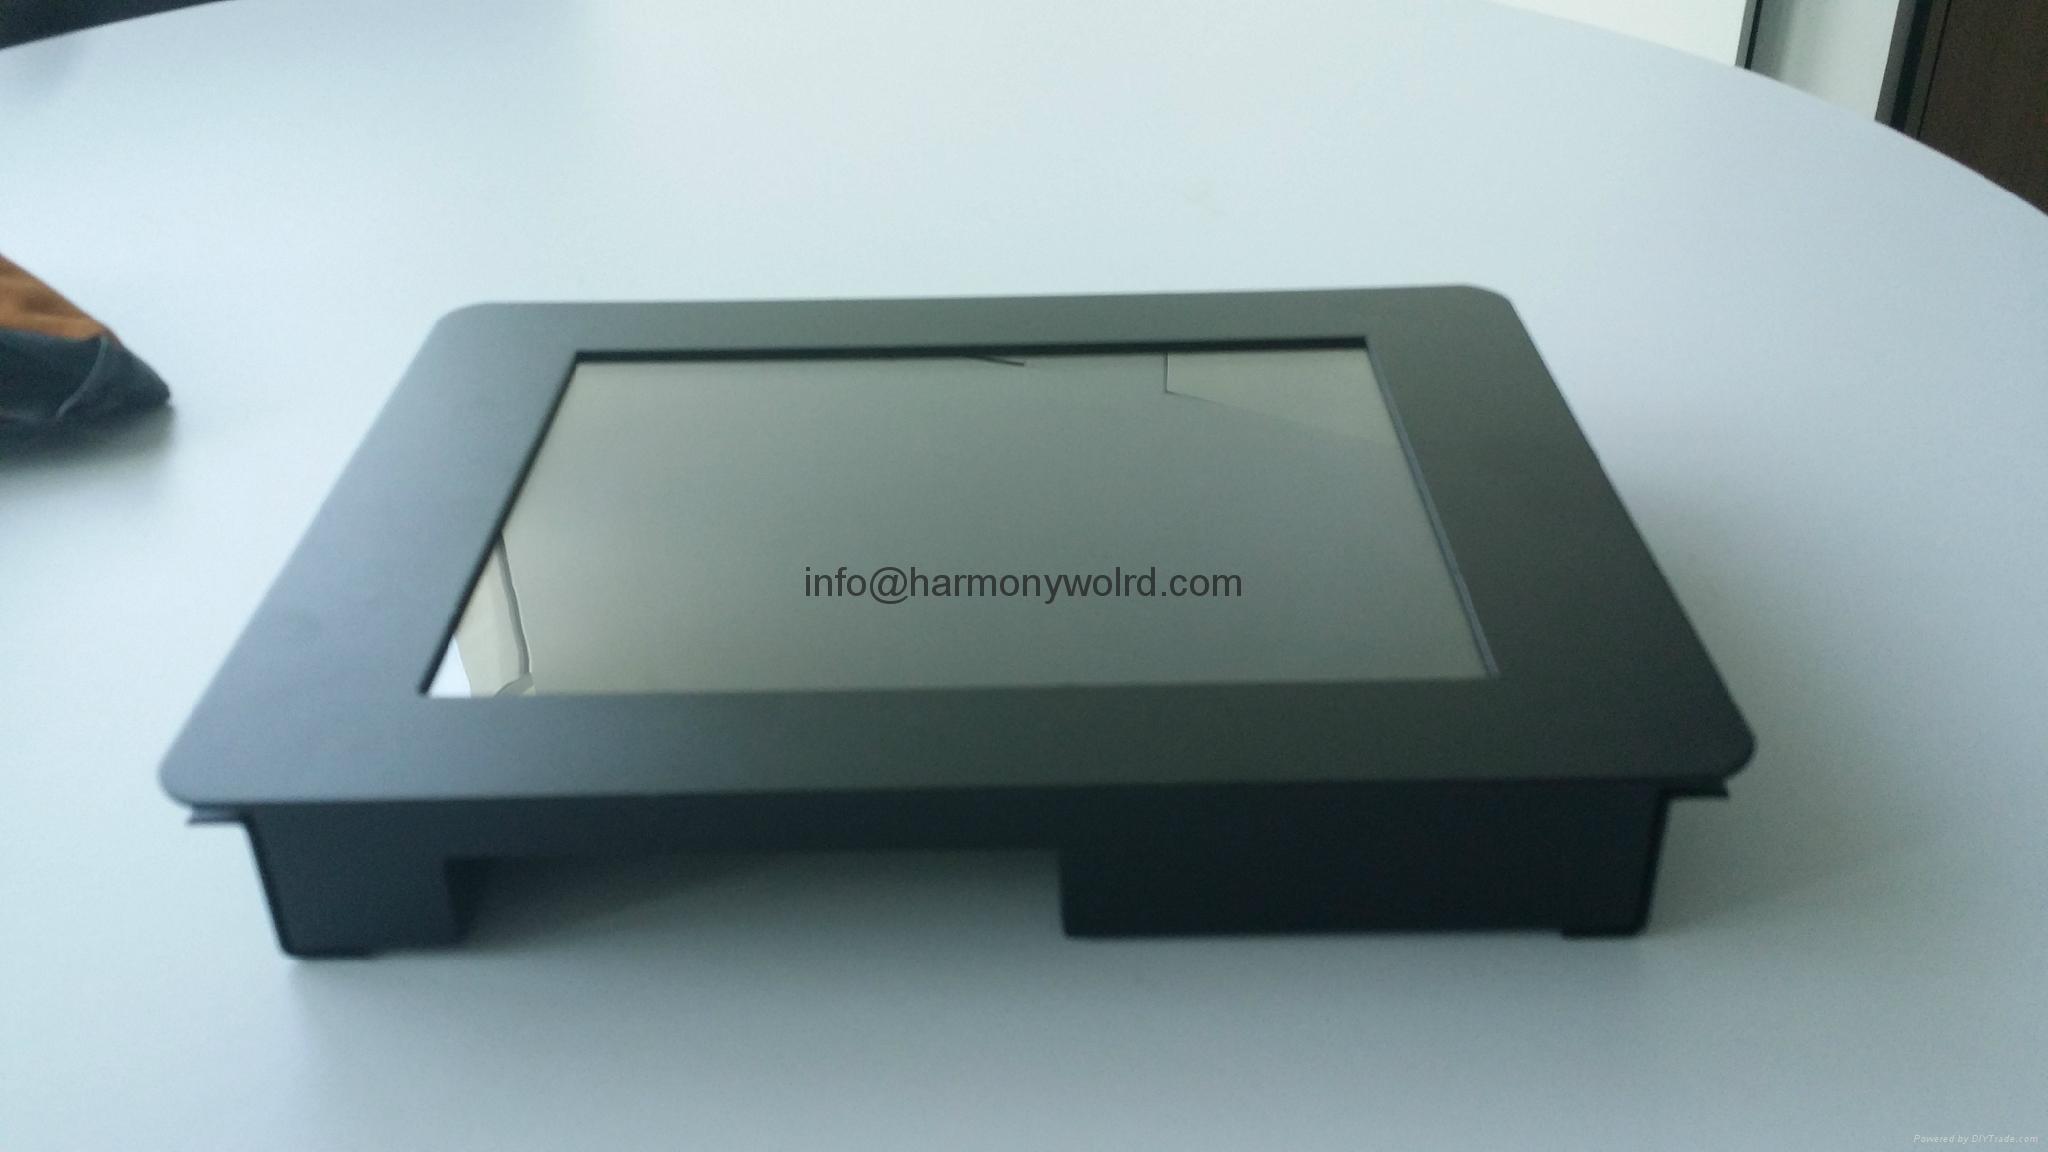 Upgrade Hitachi Seiki Monitor nm1231a11 nm1231a10 nm0129 nm-0135 siicrt 01-14-00 3